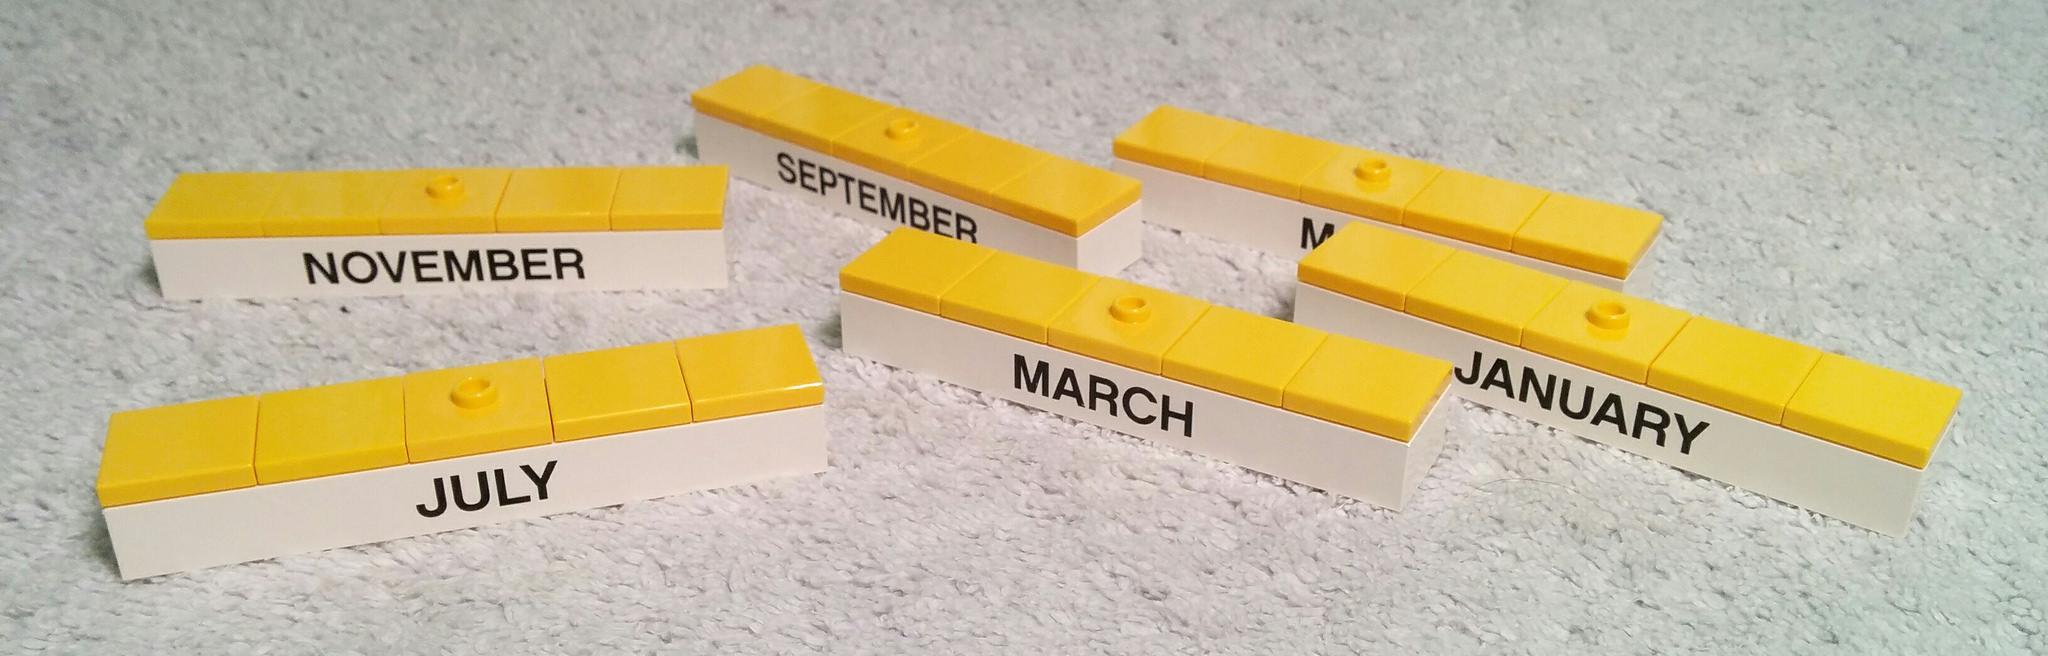 year calendar in lego bricks